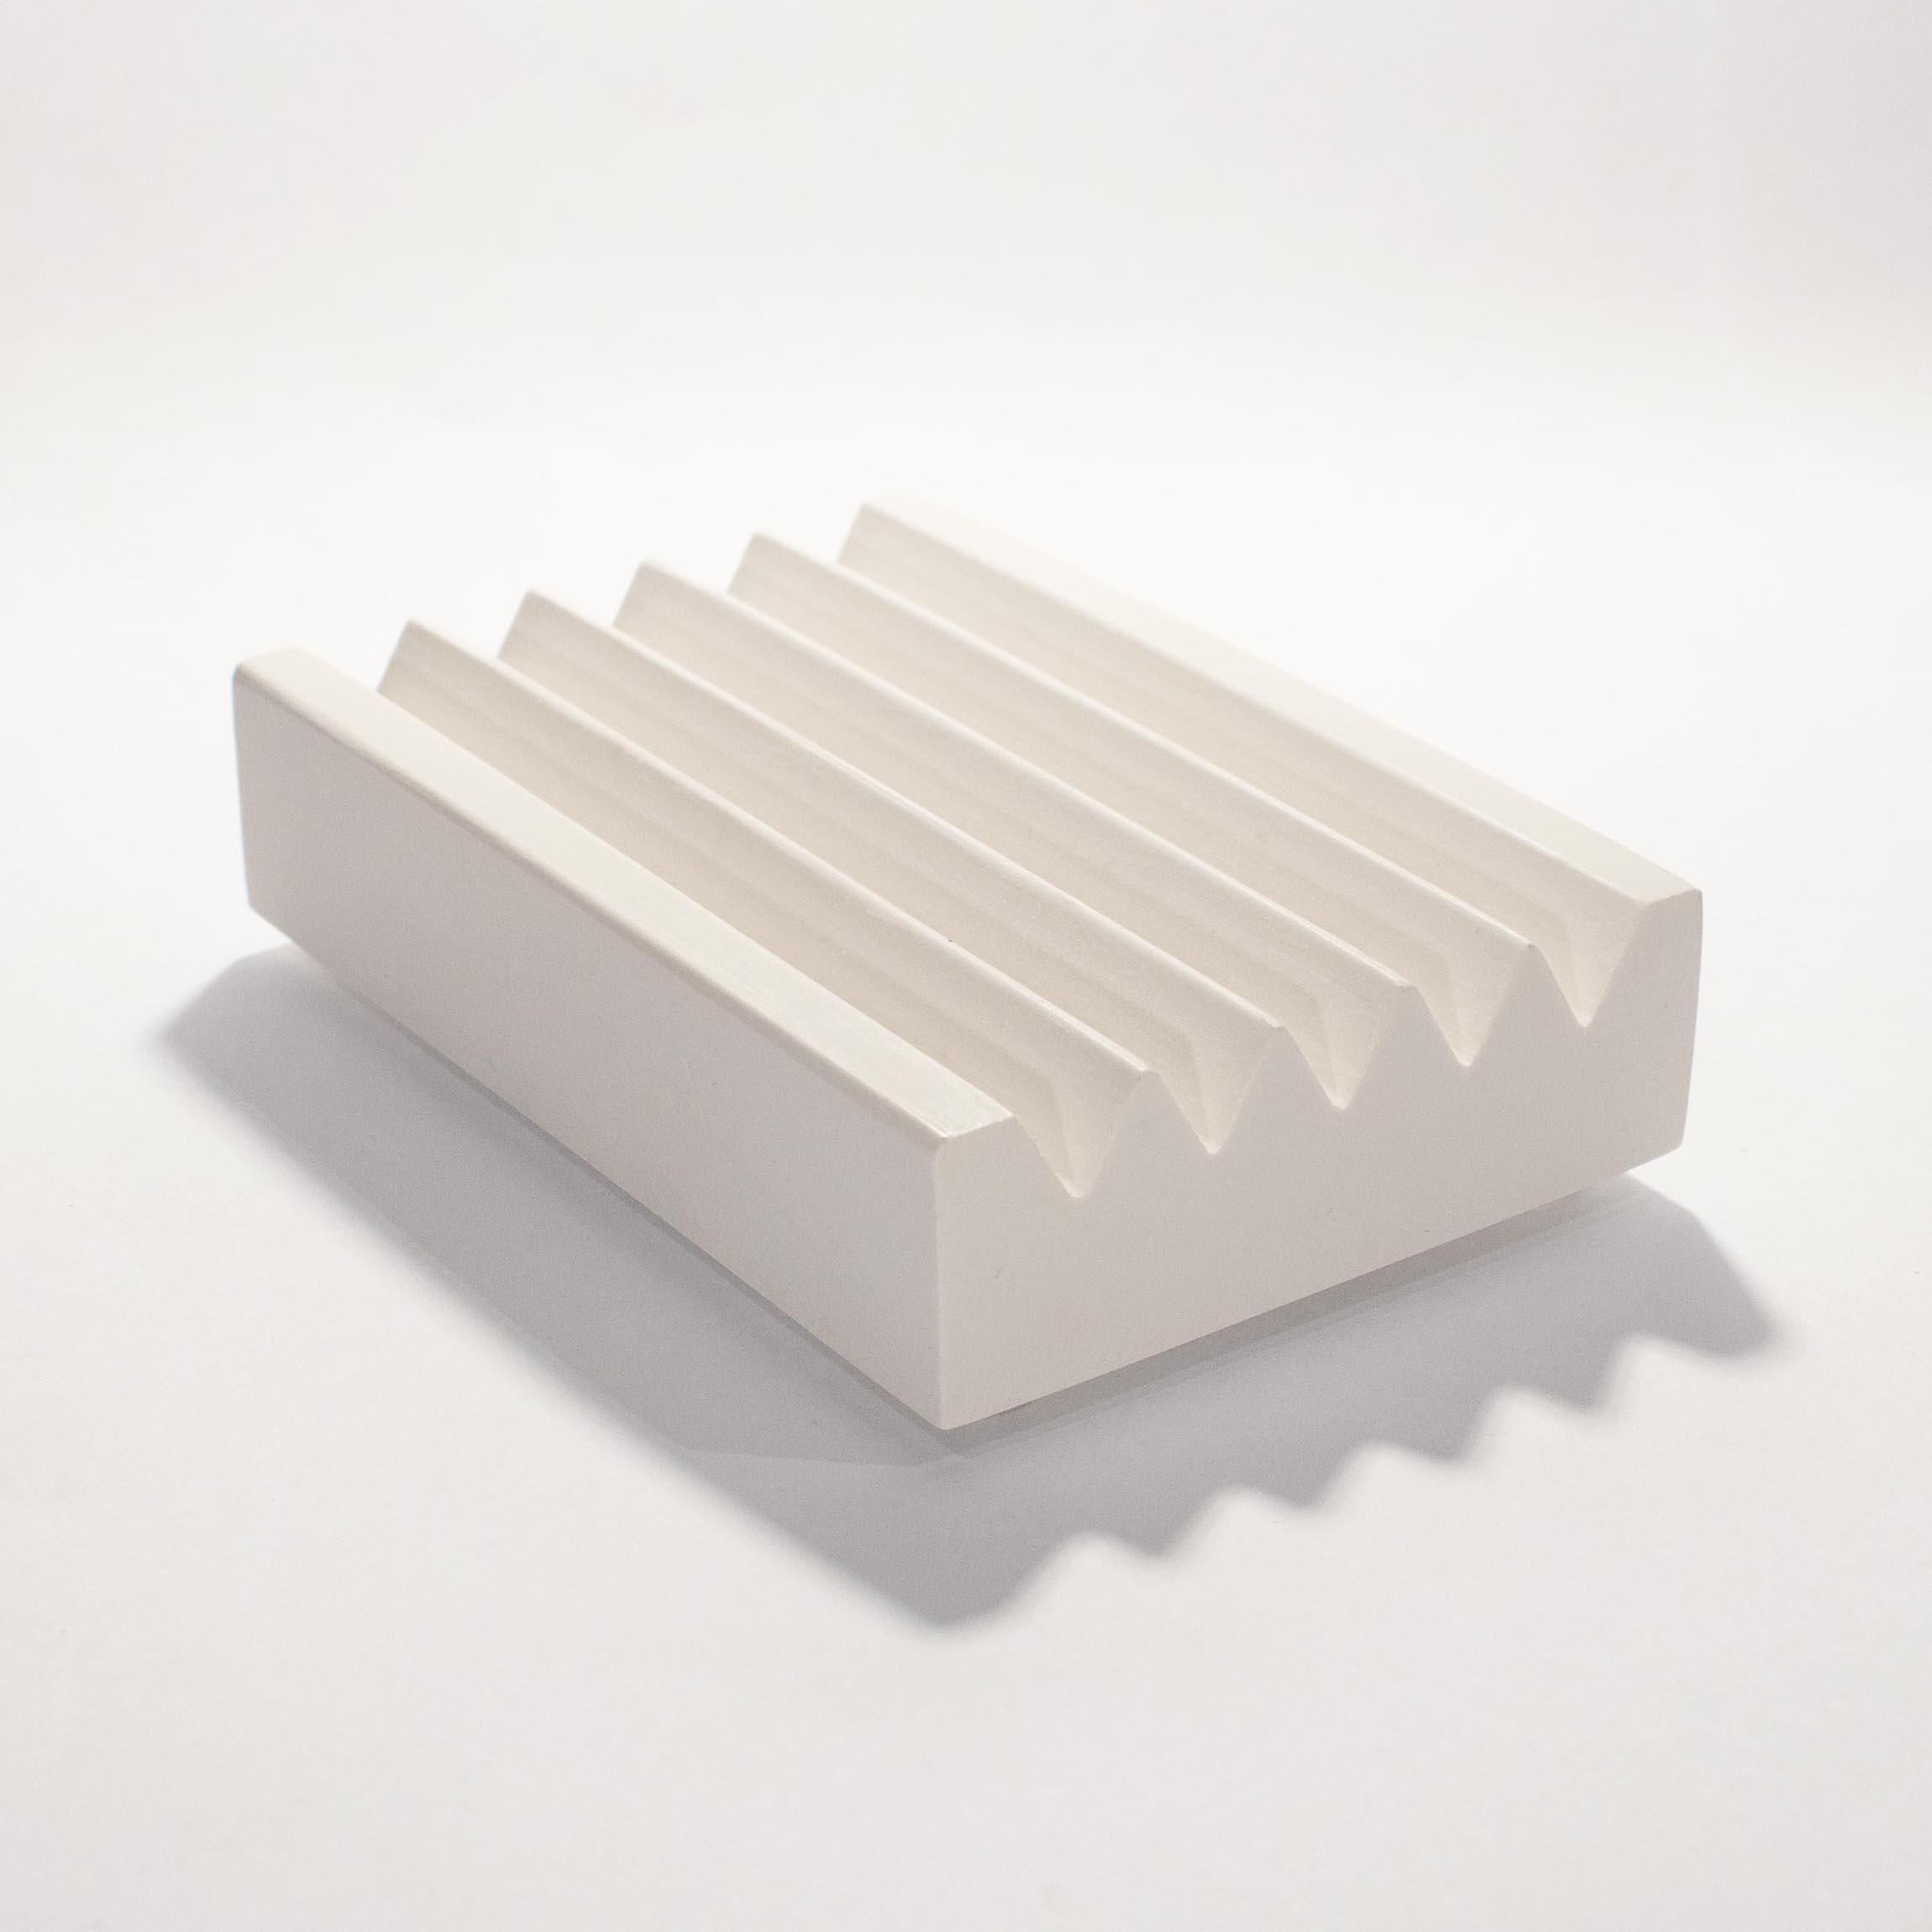 Legra Soap Stand